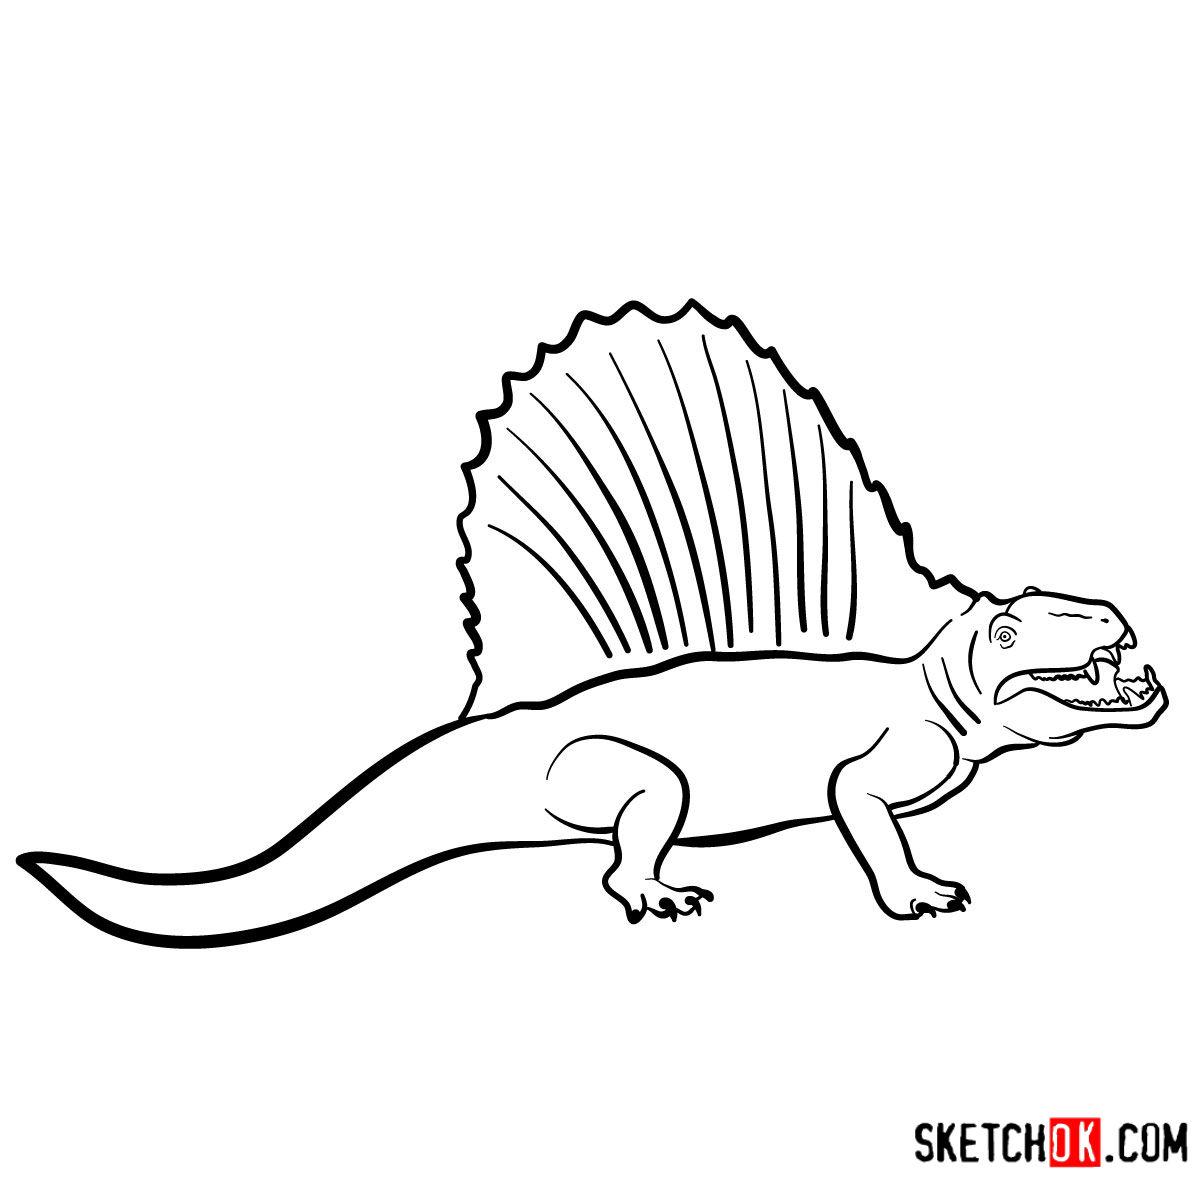 Giganotosaurus Kleurplaat • Kidkleurplaat.nl